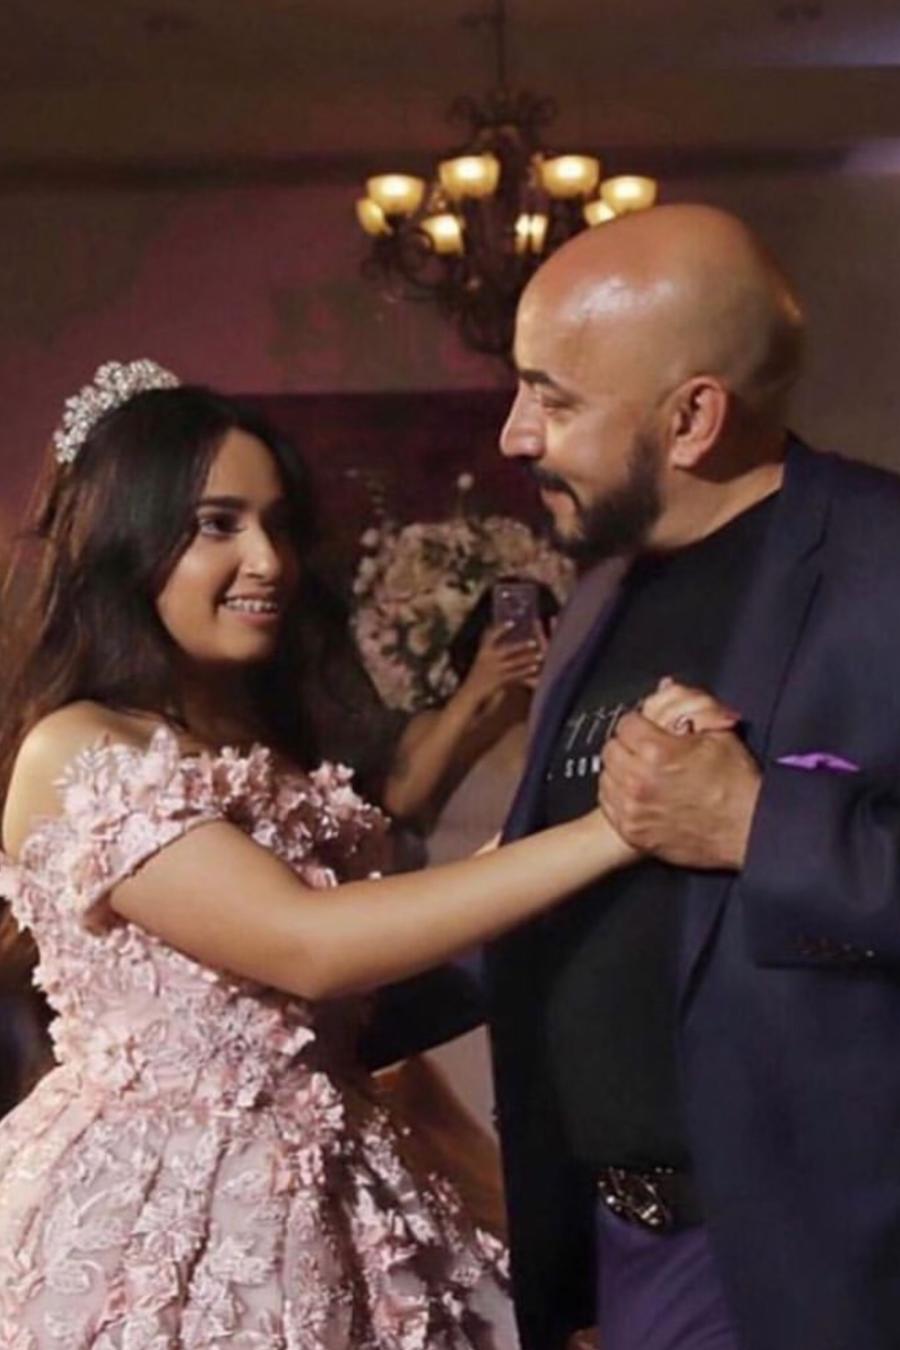 Lupillo Rivera y la fiesta de quince sorpresa a su hija Lupita Karizma